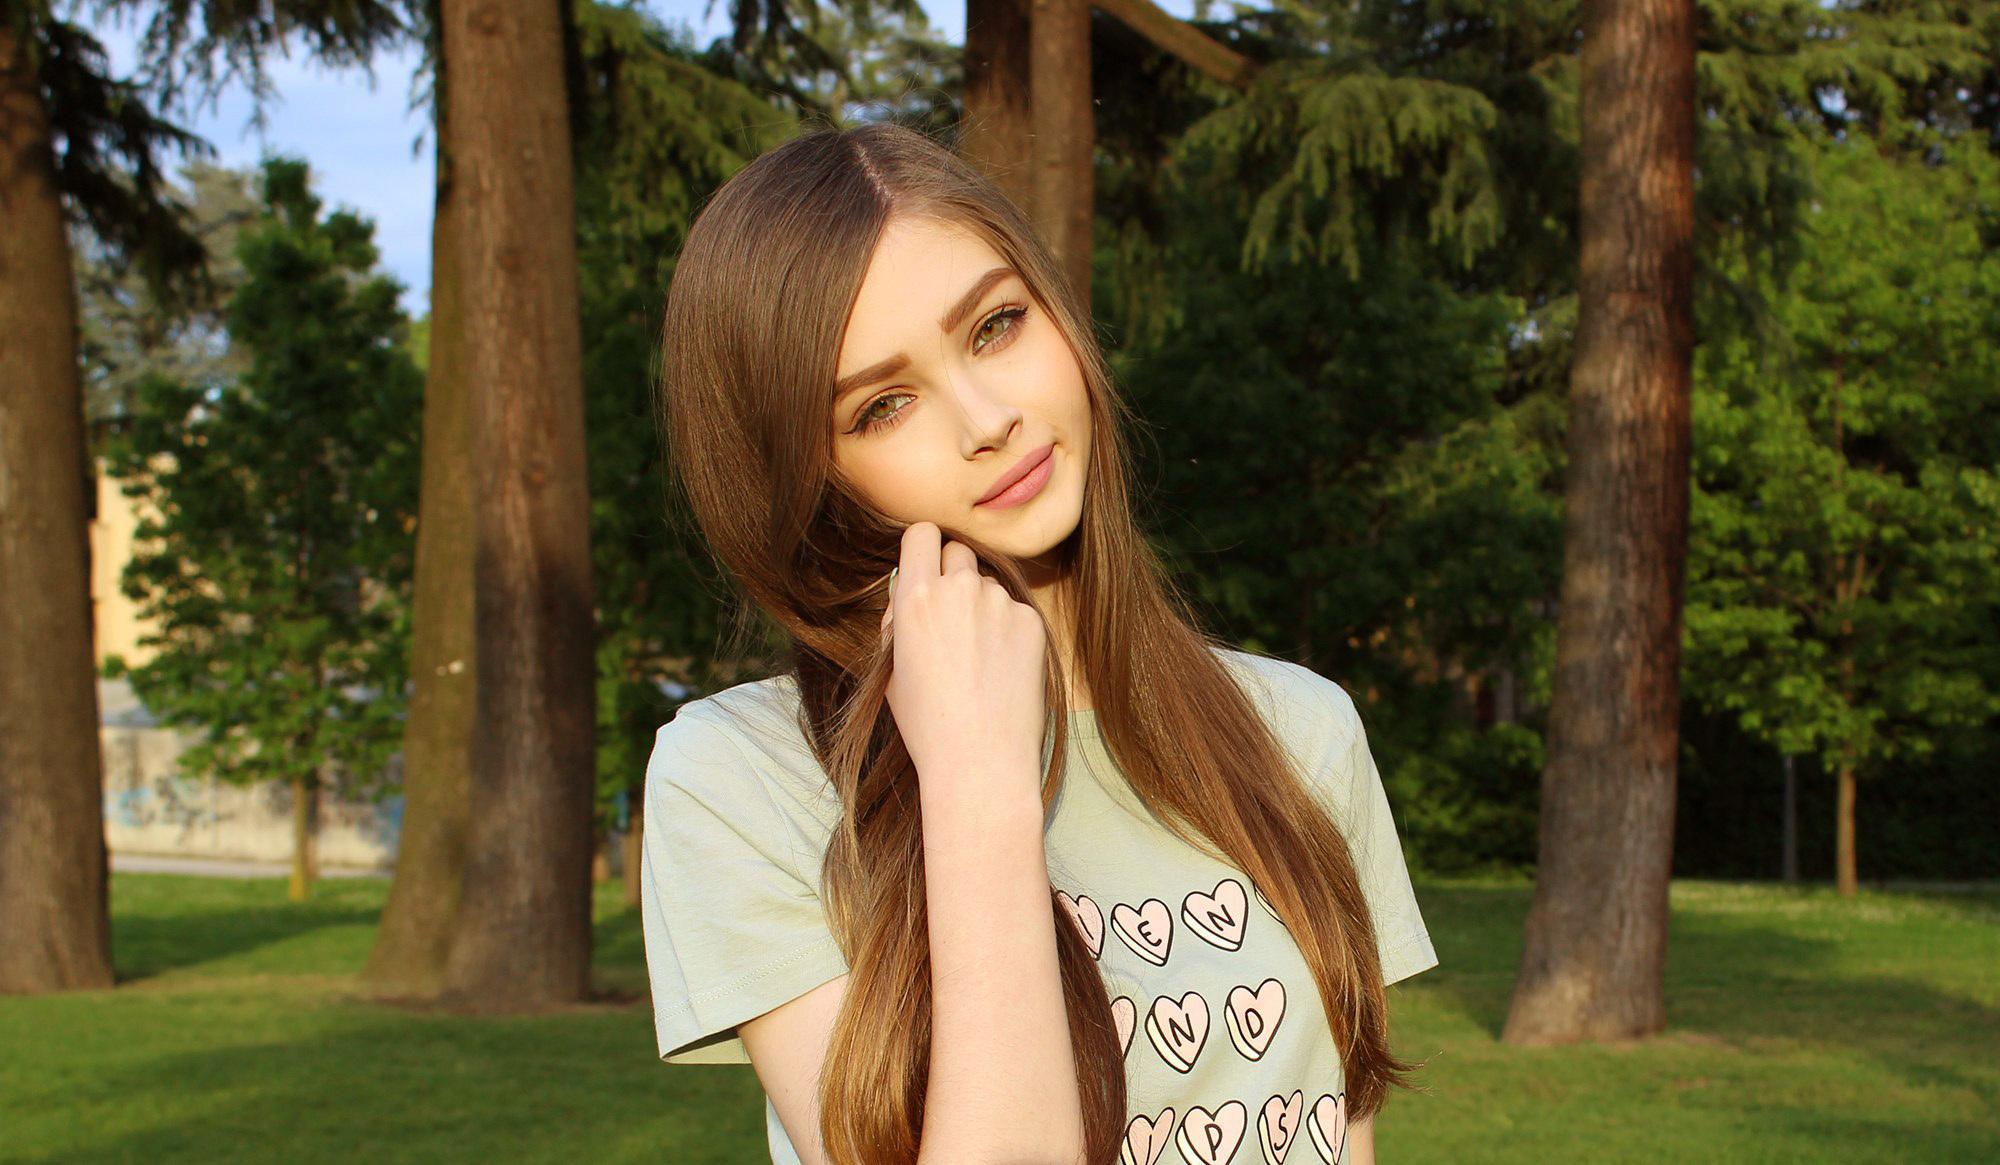 Коммент на фото красивой девушки